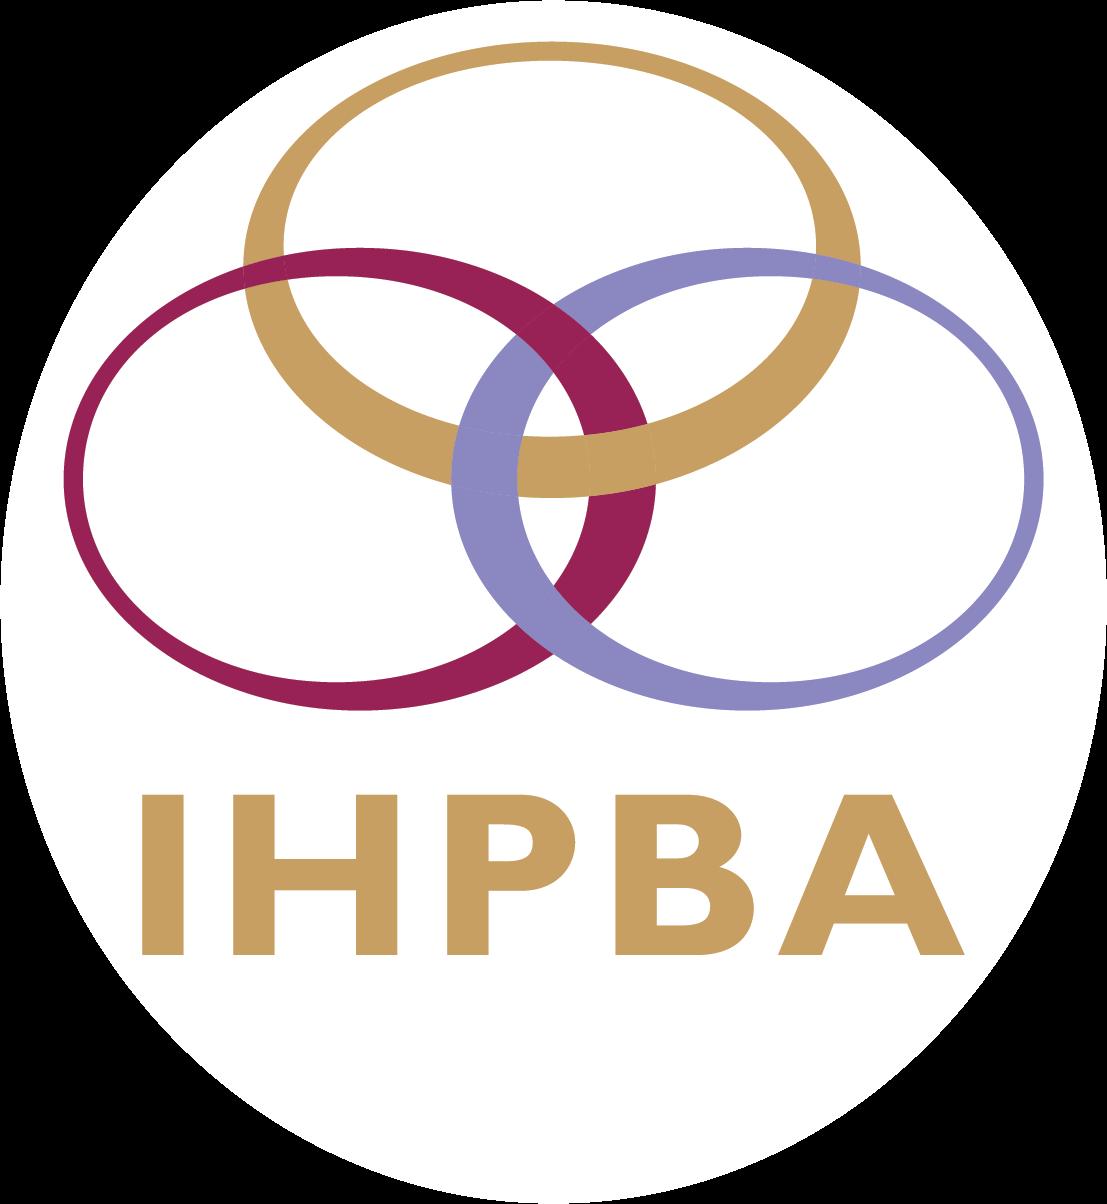 IHPBA logo